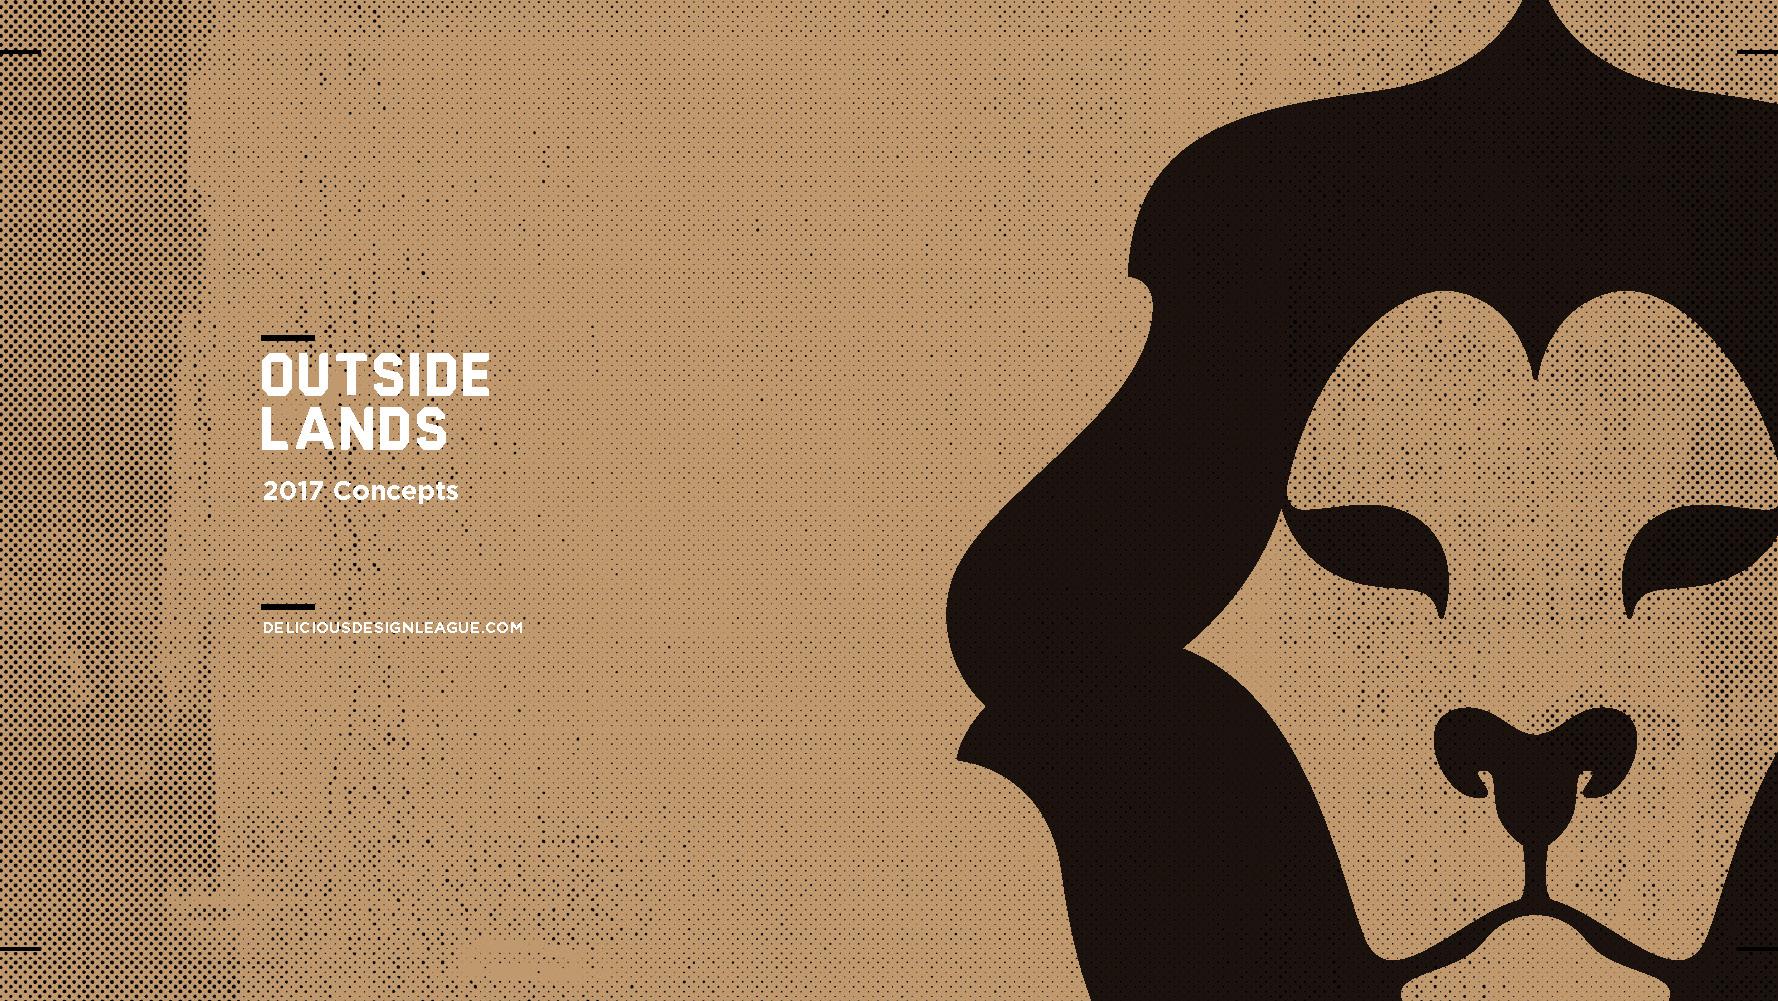 DDL_OutsideLands_Concepts_Page_01.jpg